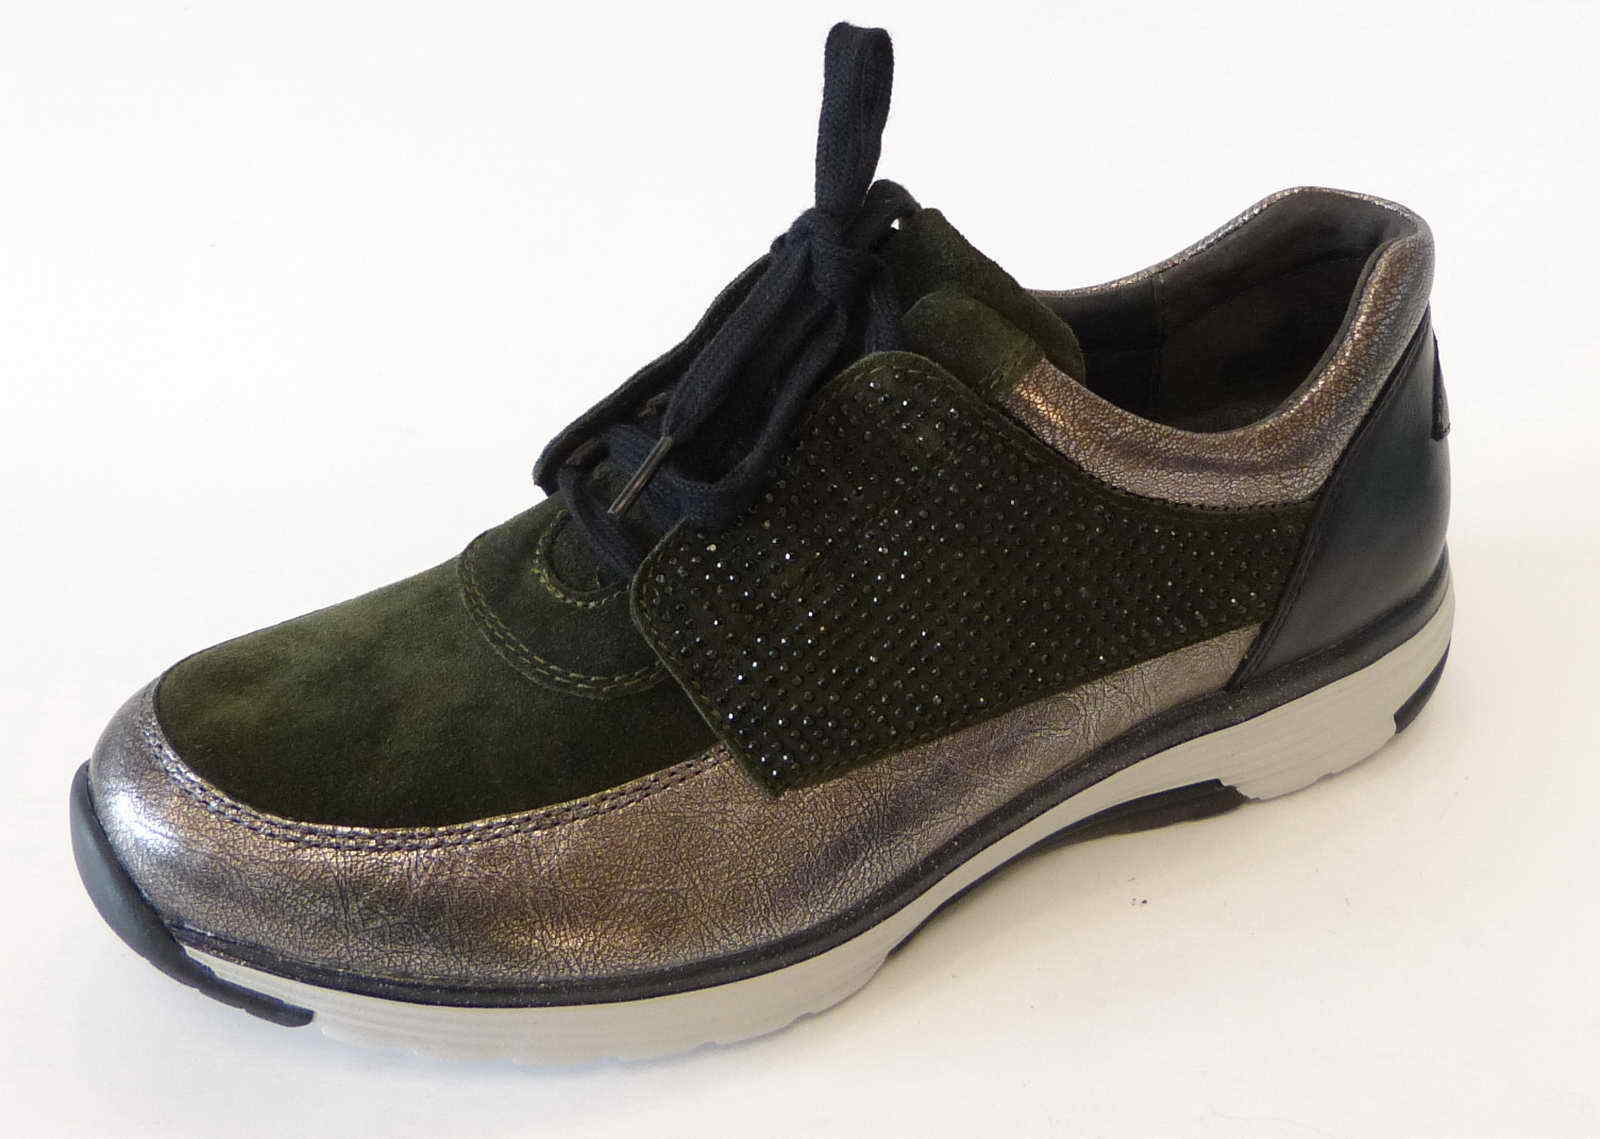 Gabor Soft Comfort Roling Sneaker Soft Gabor Schnür Sport bottel grün schwarz Nubuk 974 34 911538